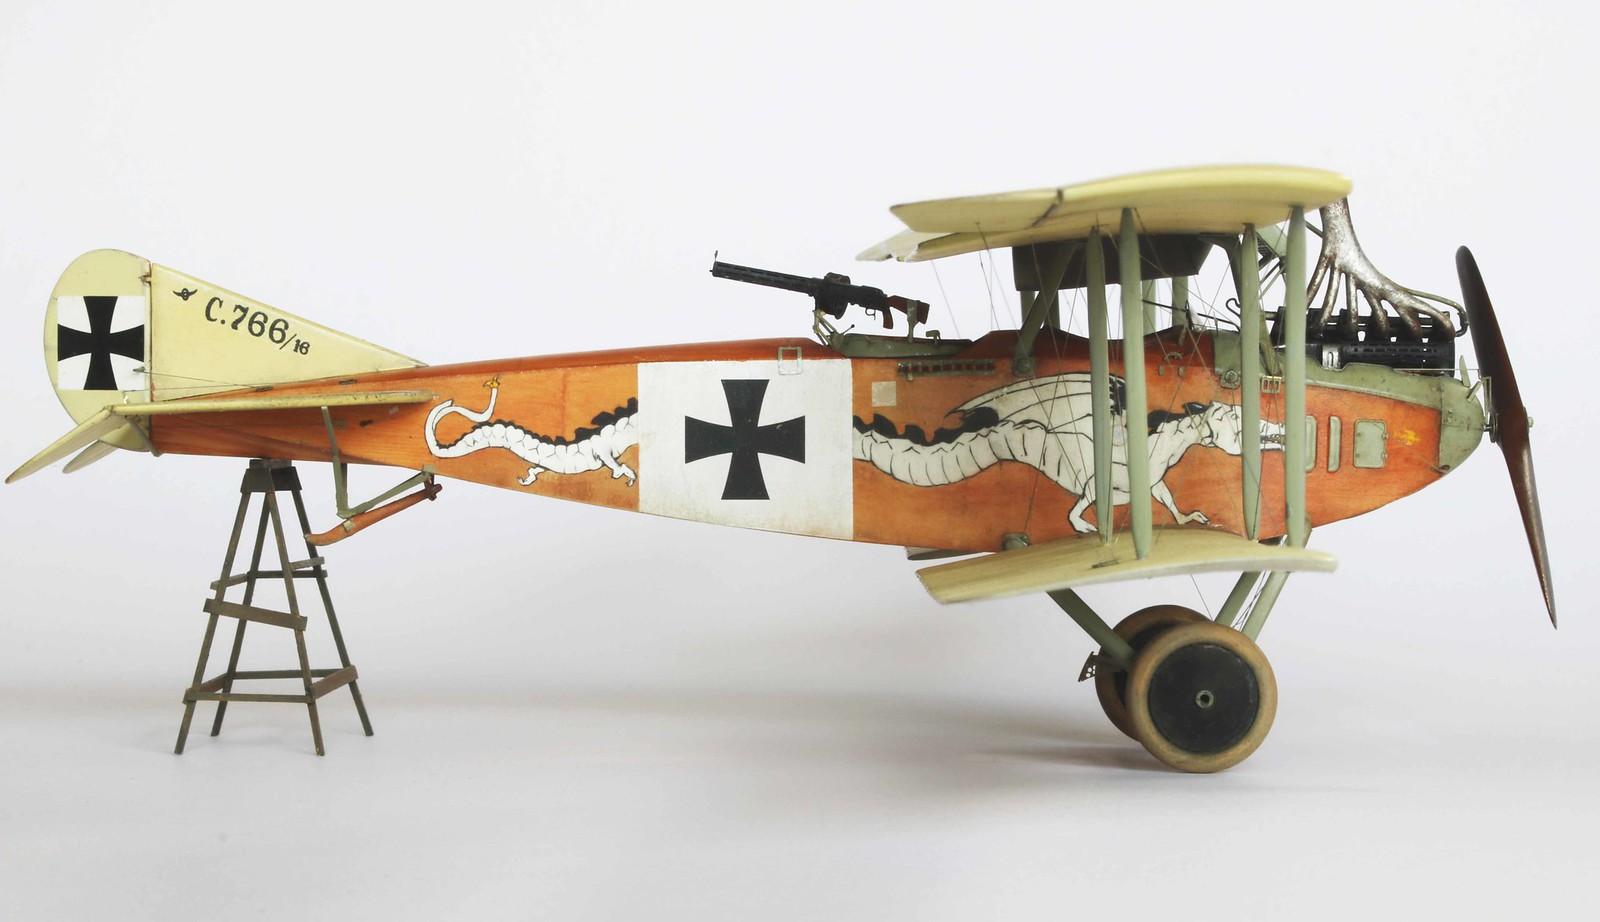 1/48 Albatros C. III   Crocodile et Dragon - Page 2 31798602477_a62f835369_h